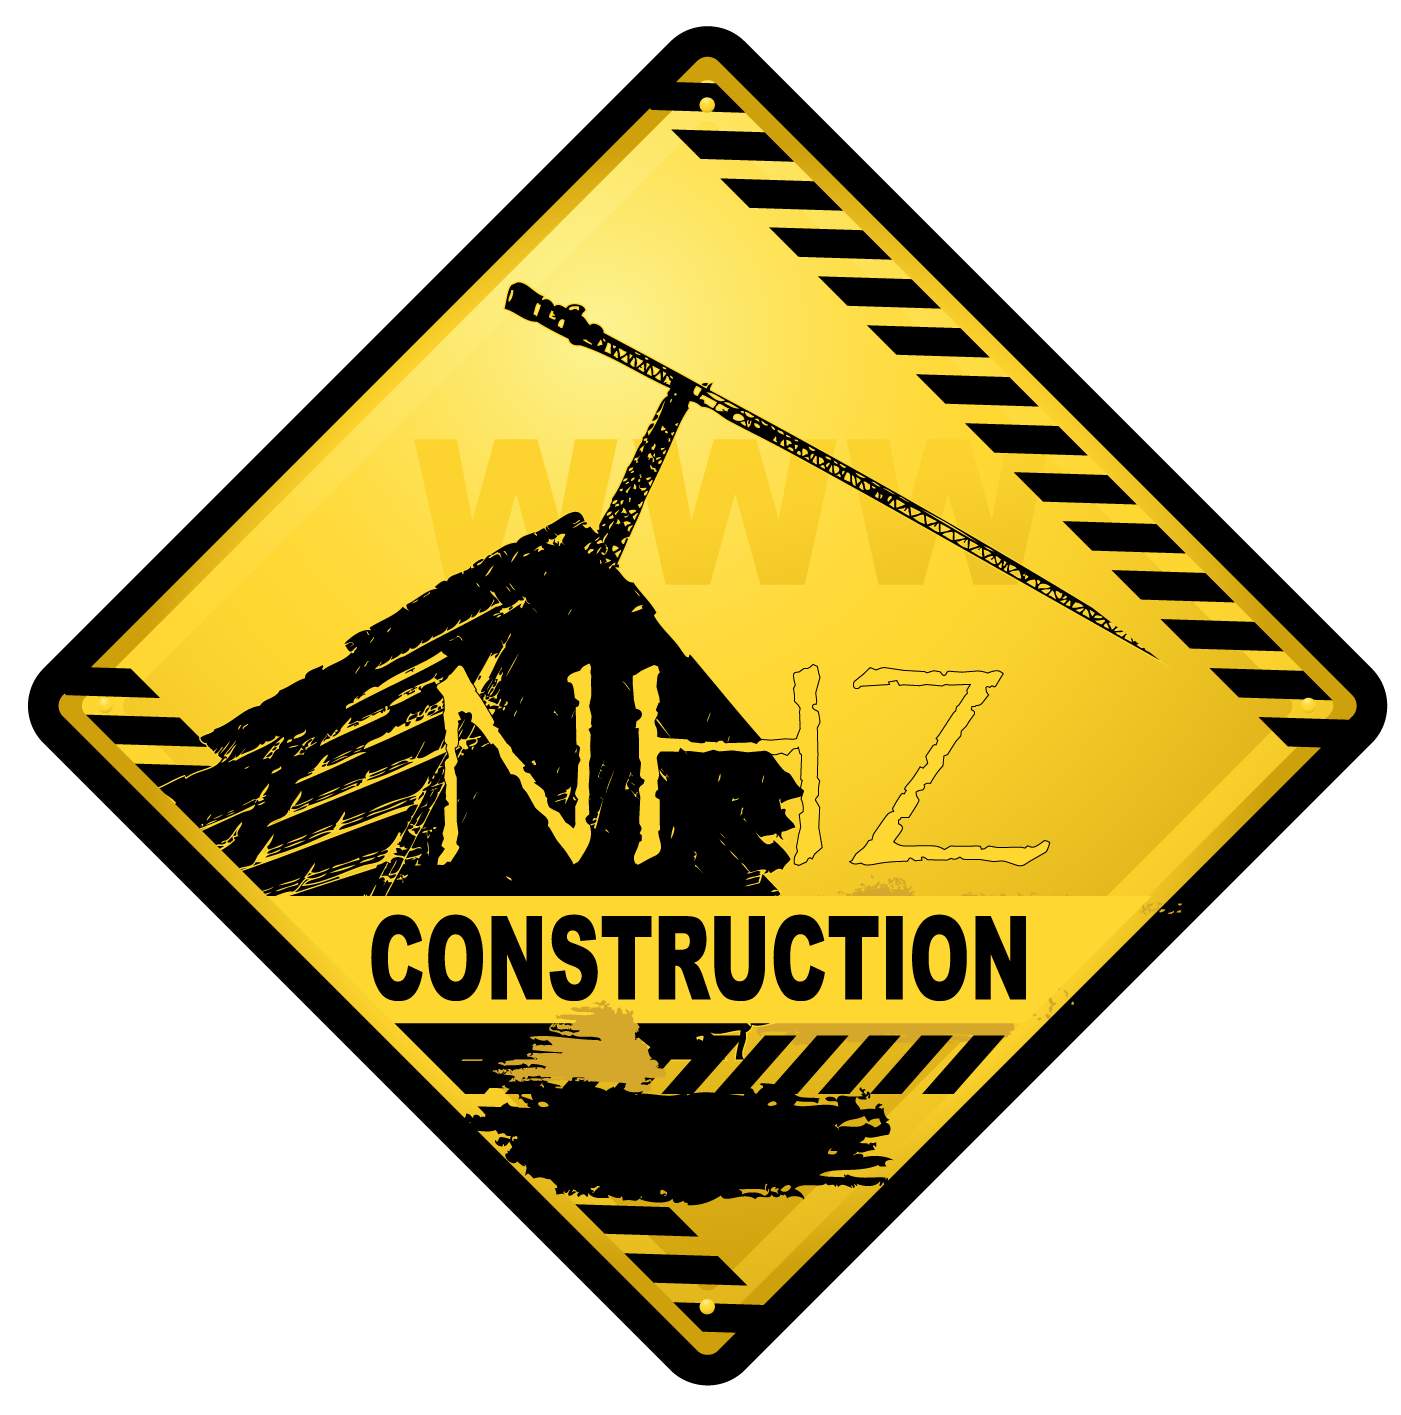 NHZ Constructions